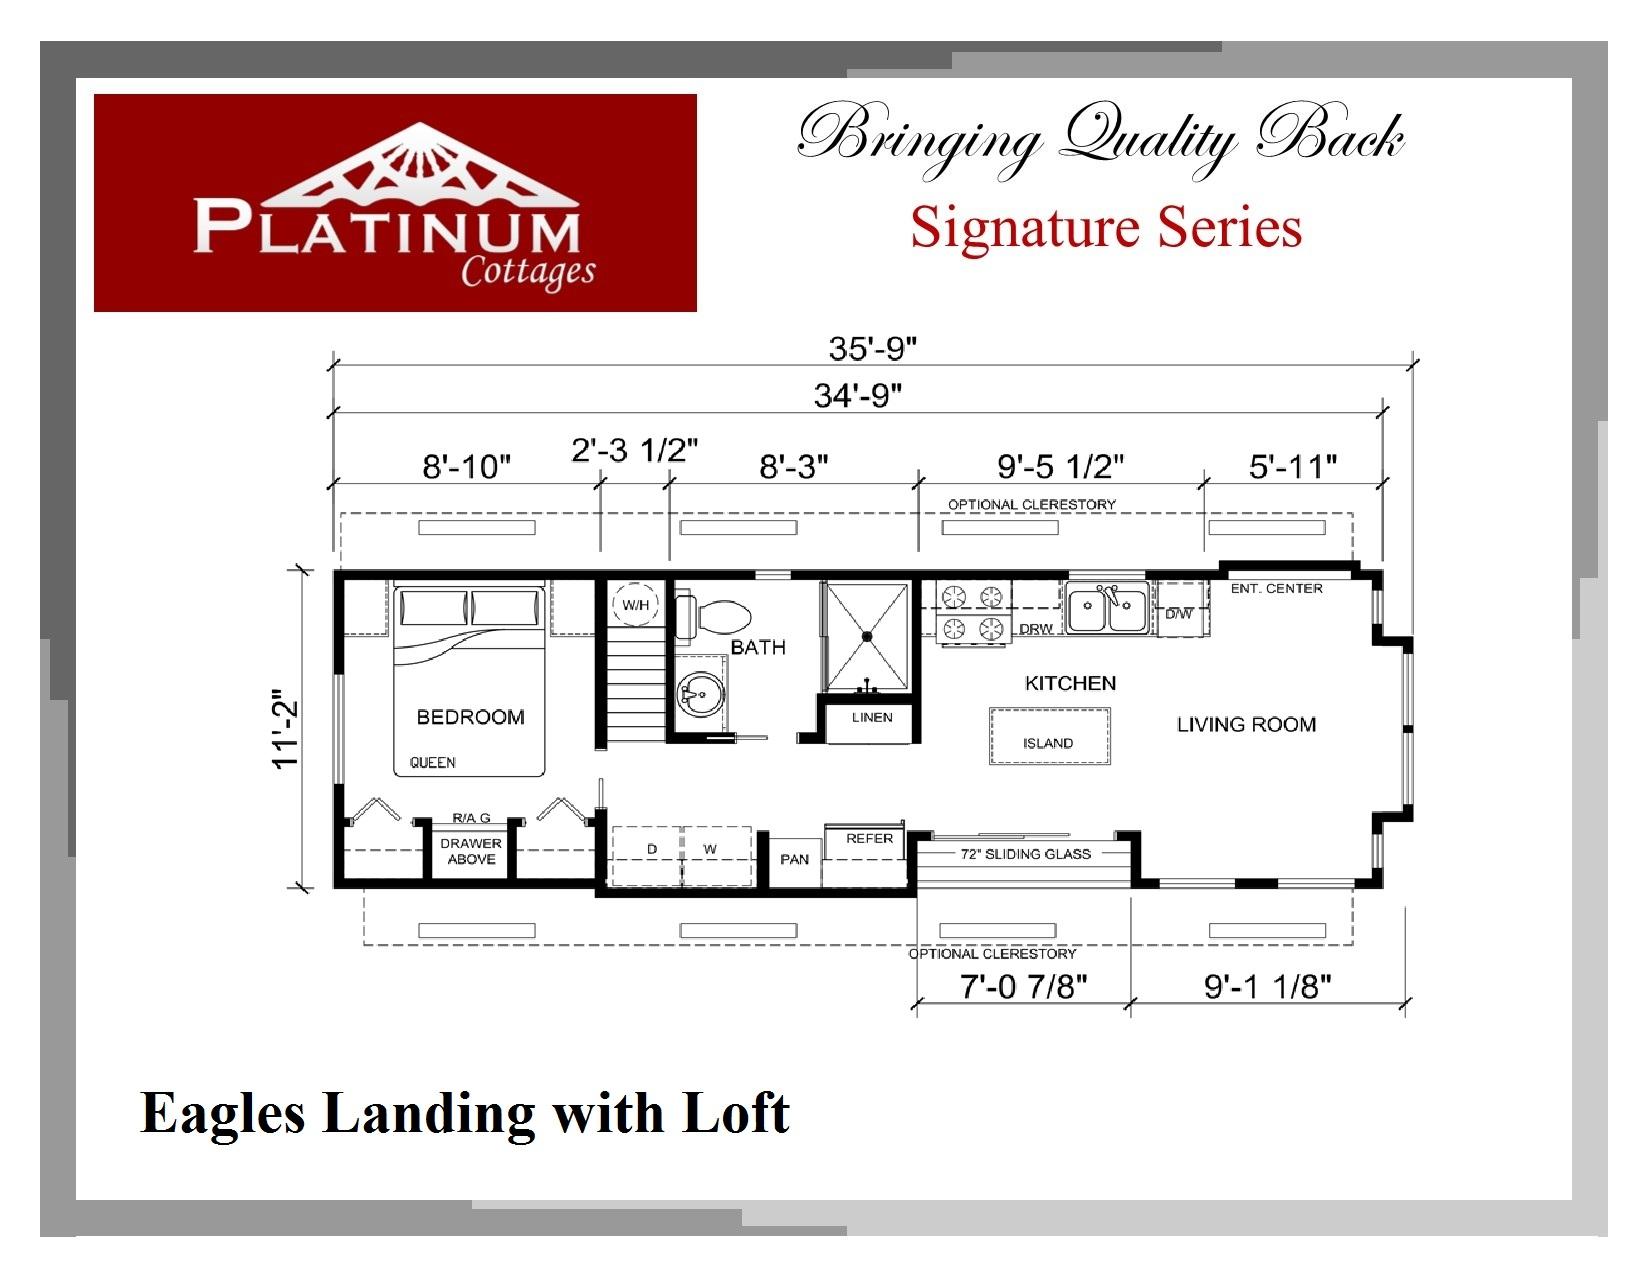 The Lincoln Floorplan